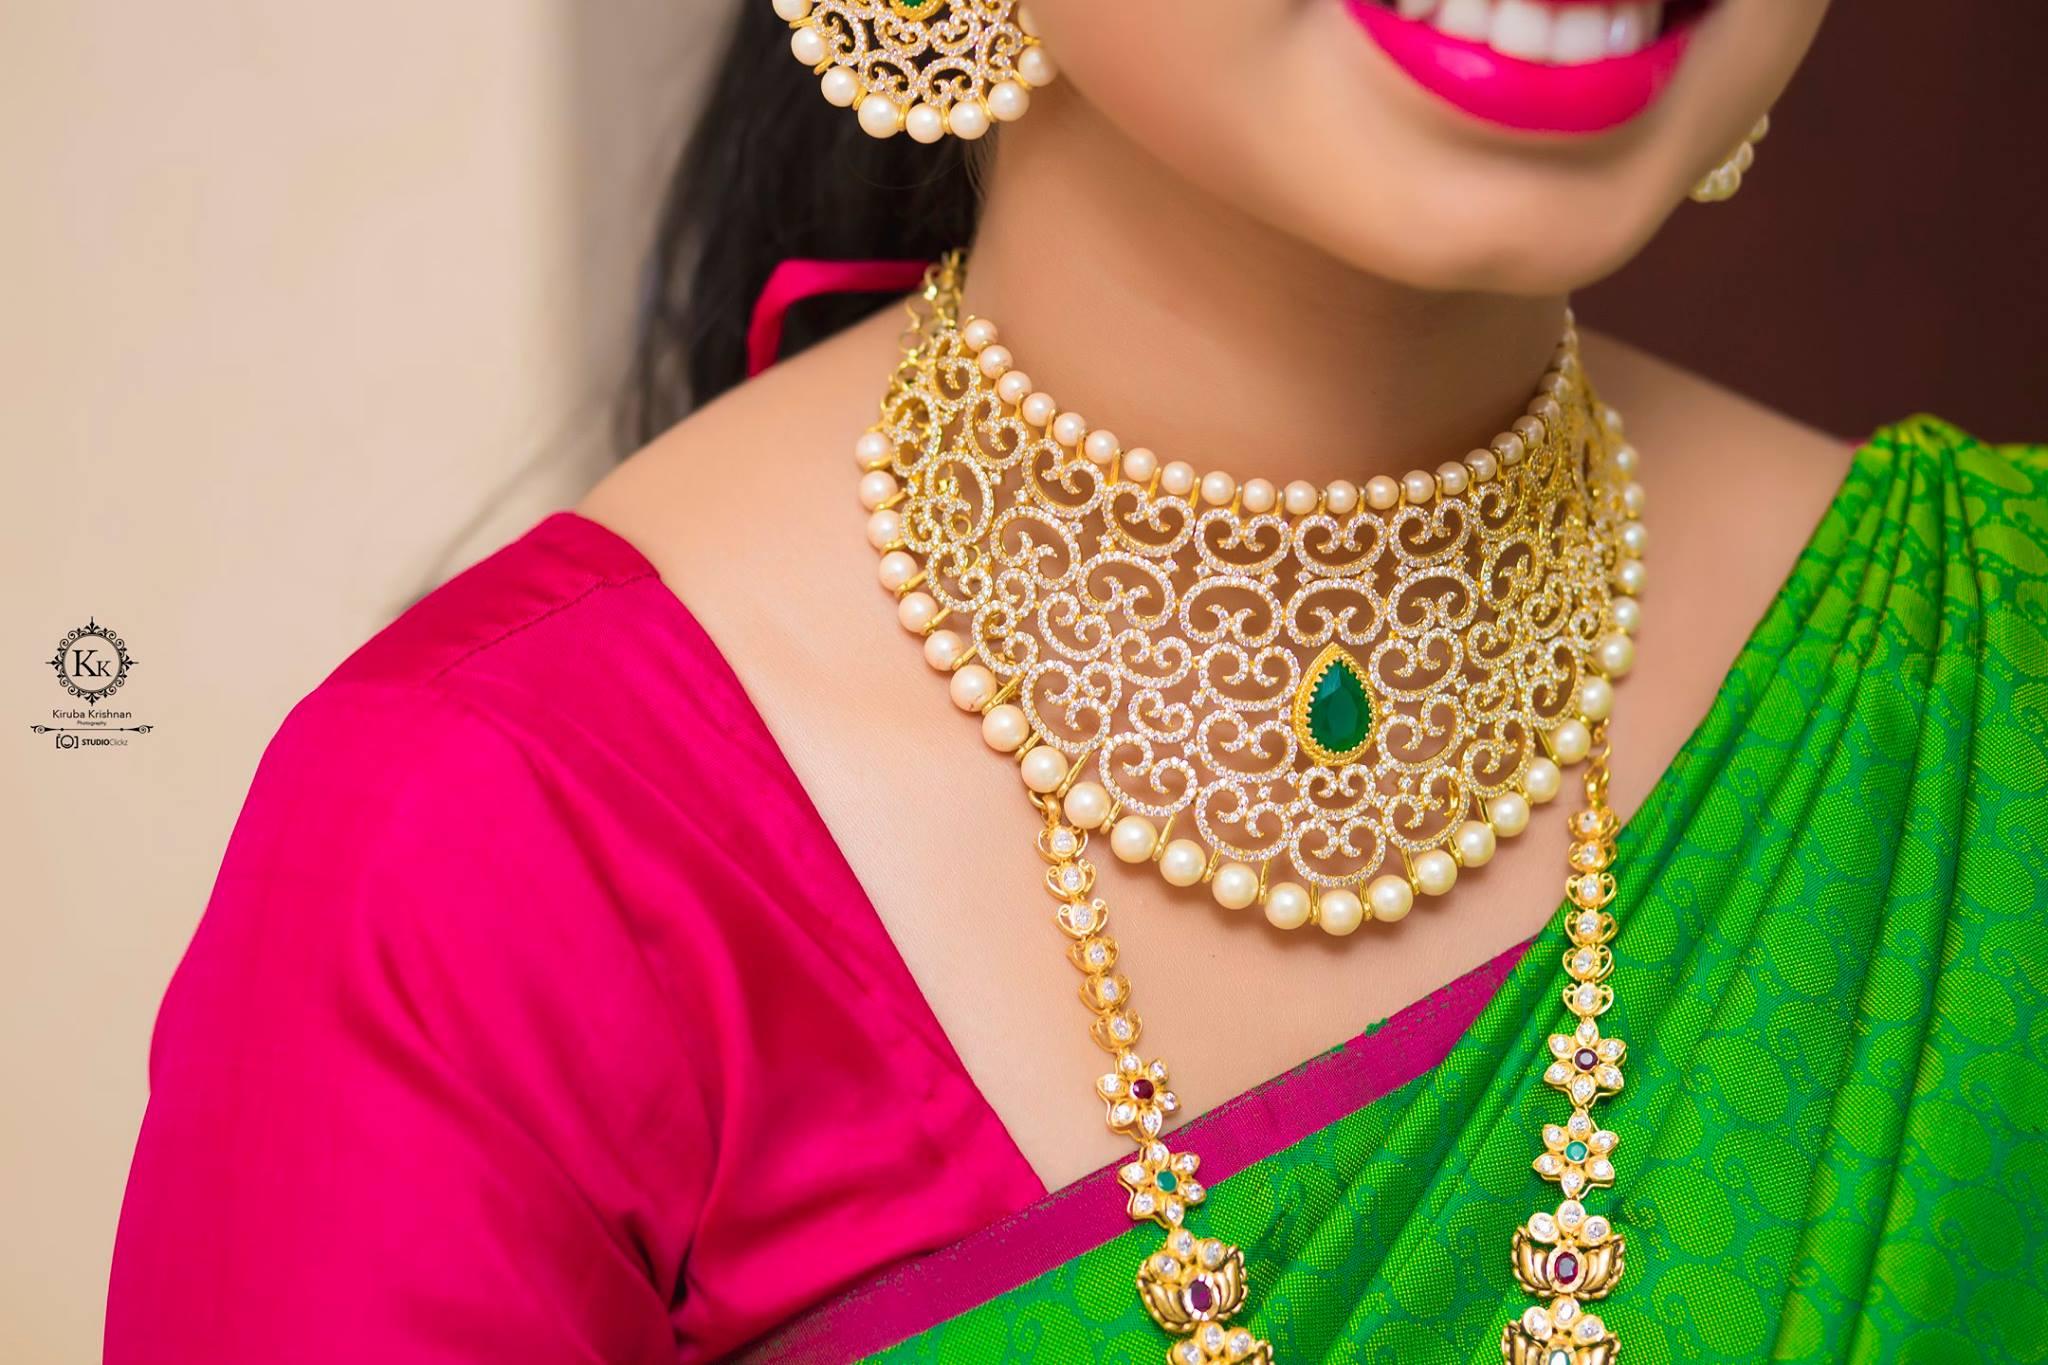 Princess-cut Neck Jewelry